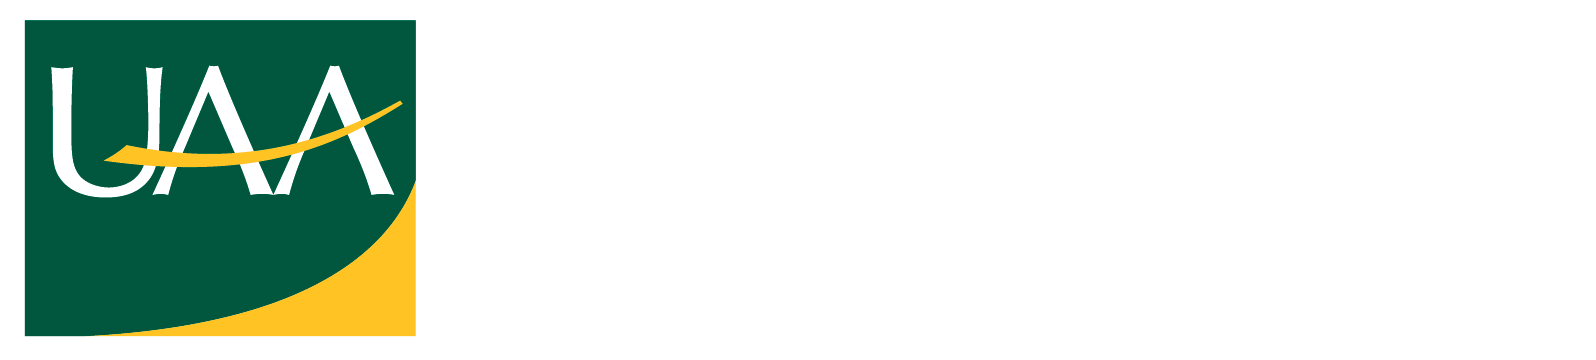 Construction, Design & Safety Division